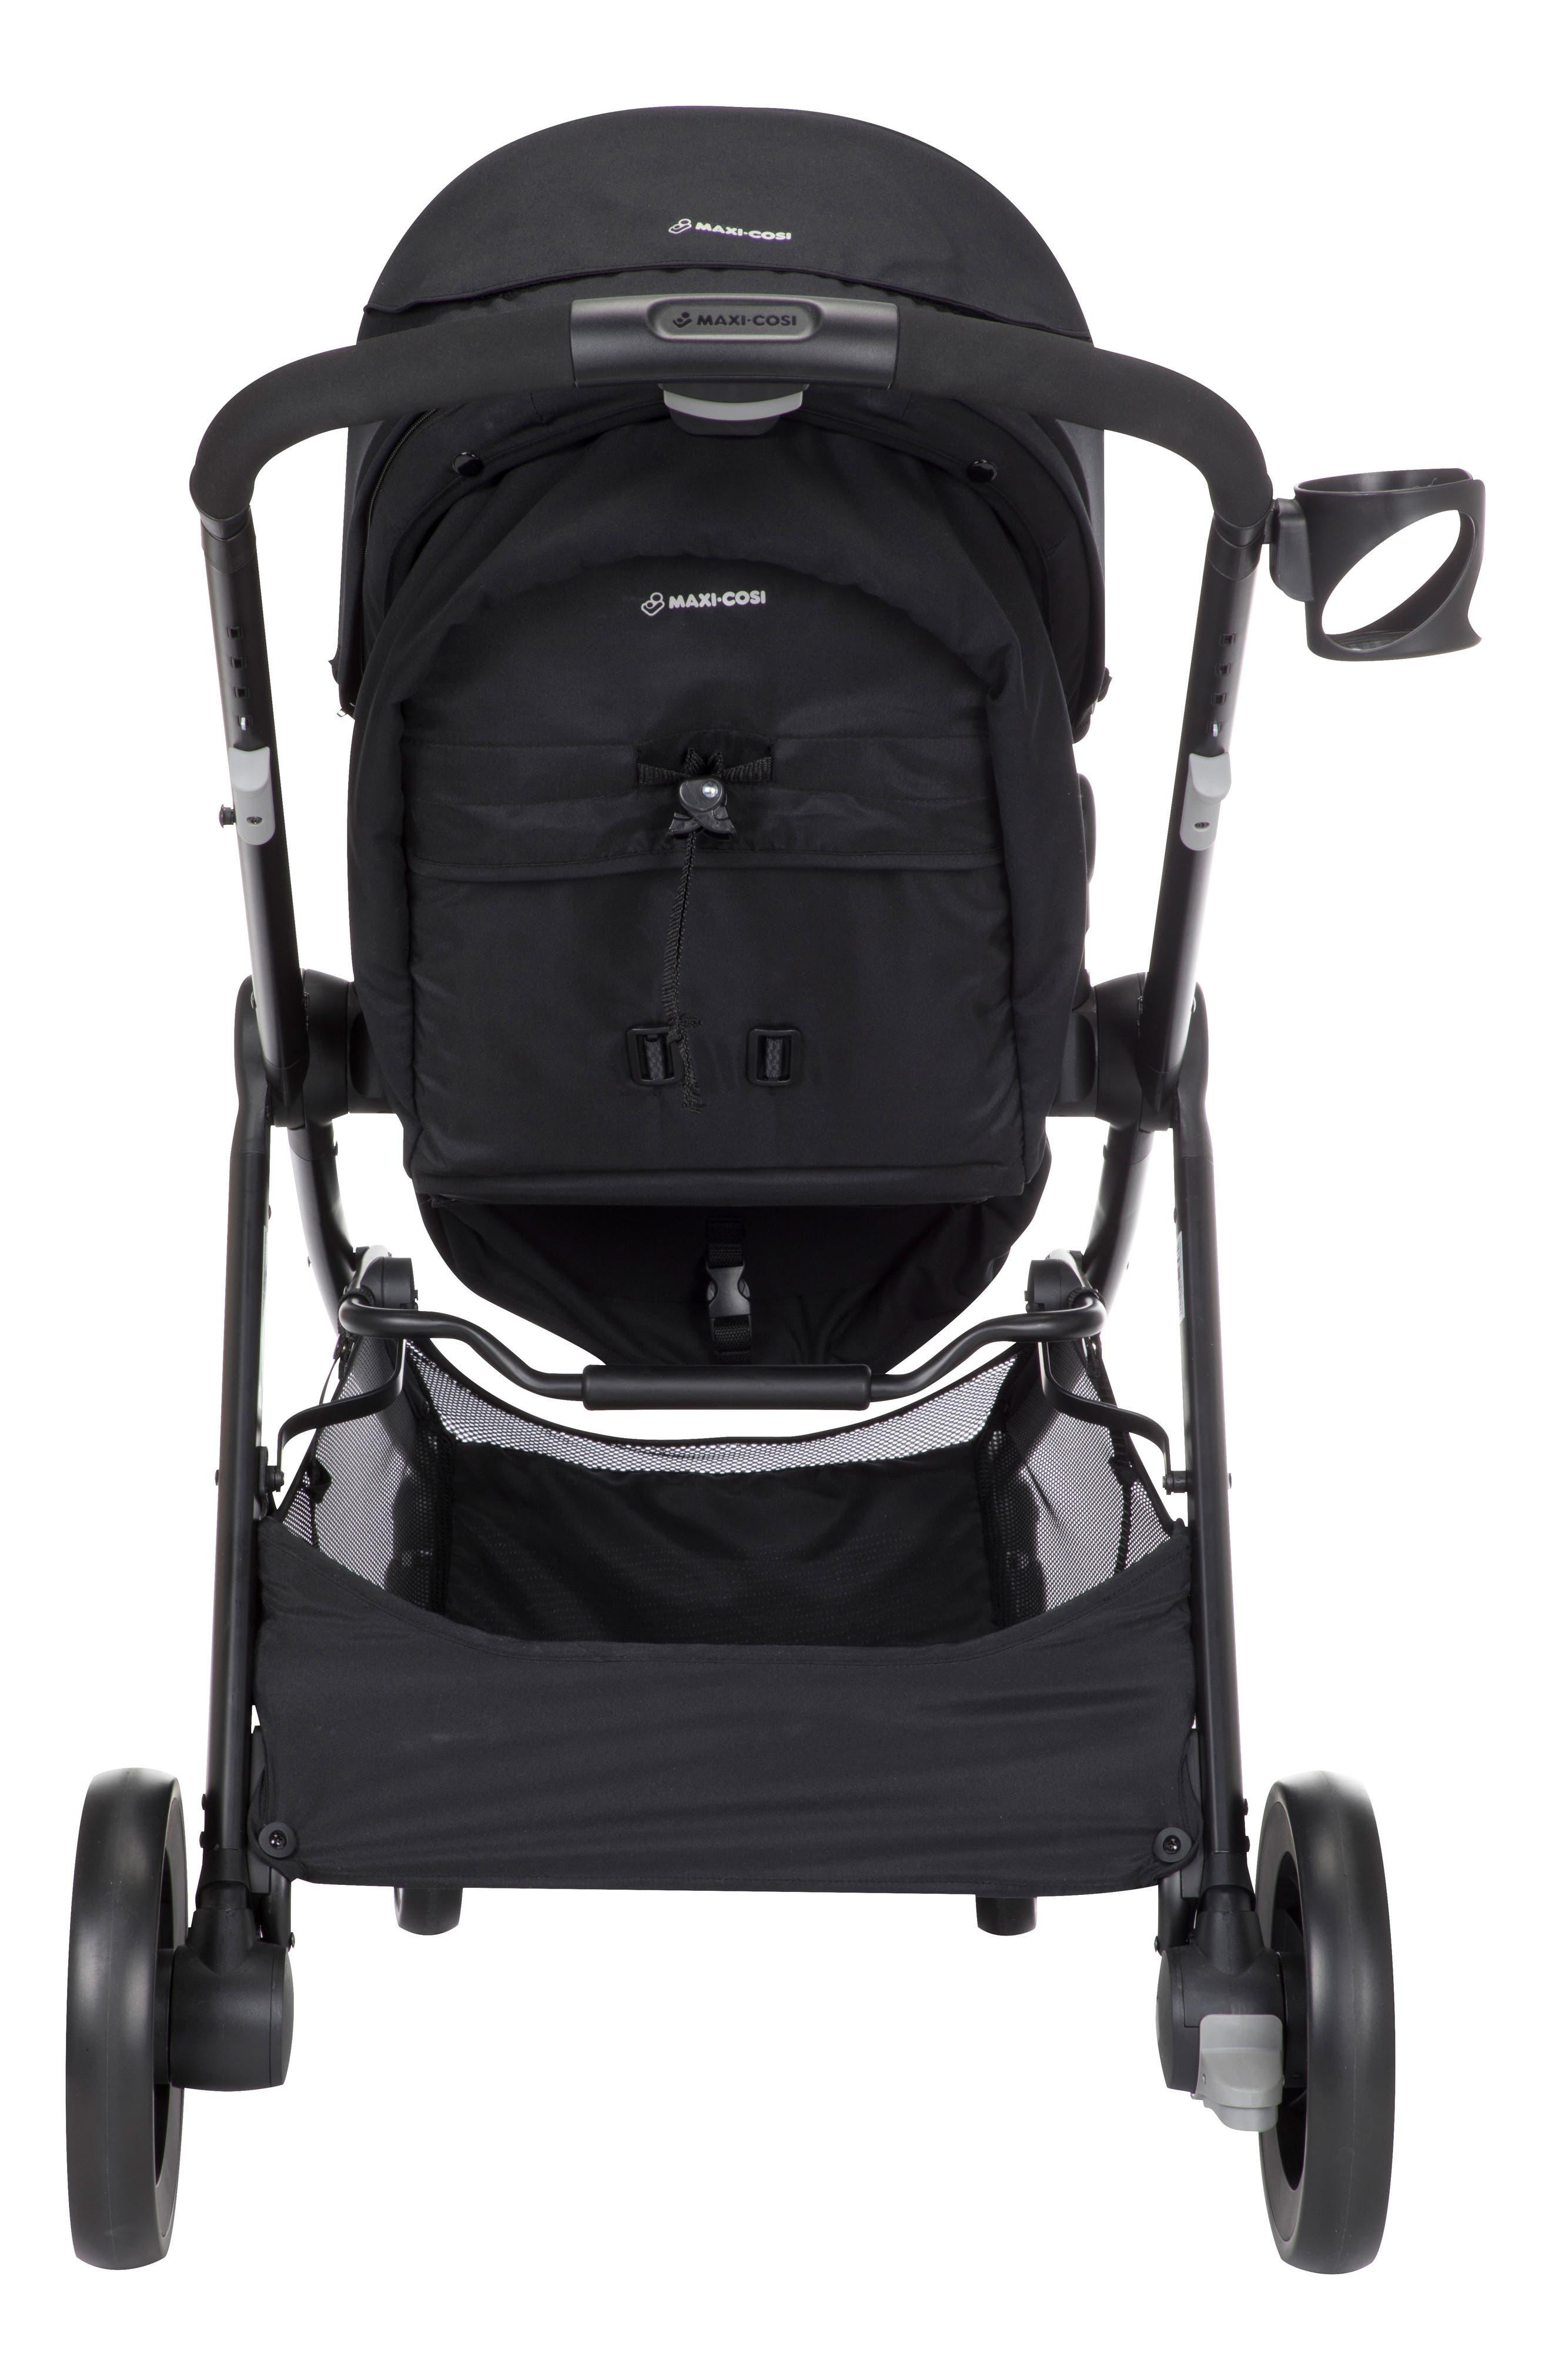 5-1 Mico 30 Infant Car Seat & Zelia Stroller Modular Travel System,                             Alternate thumbnail 3, color,                             NIGHT BLACK